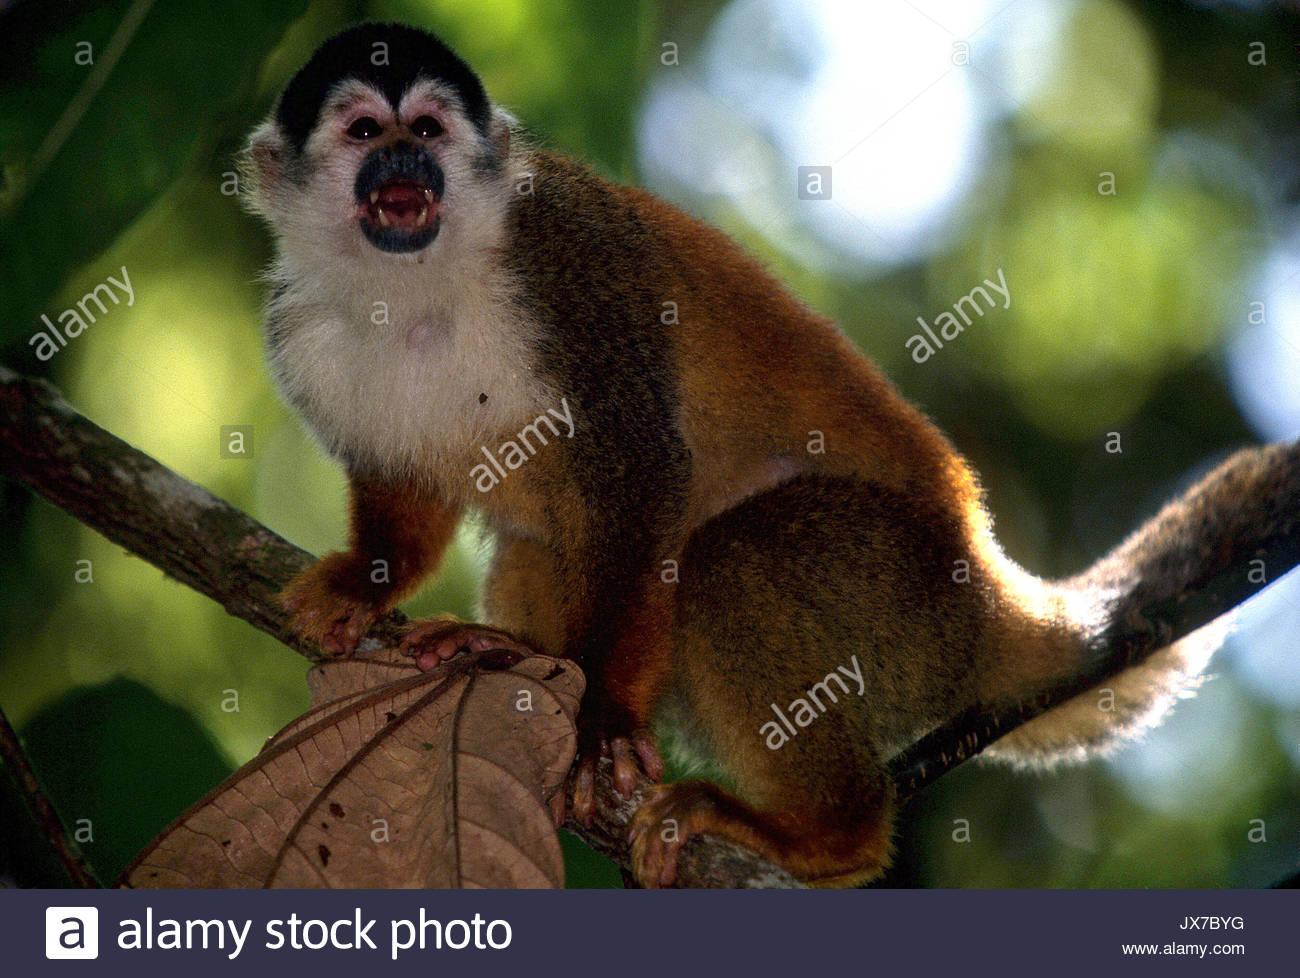 Portrait of a Central American squirrel monkey, Saimiri oerstedii. - Stock Image